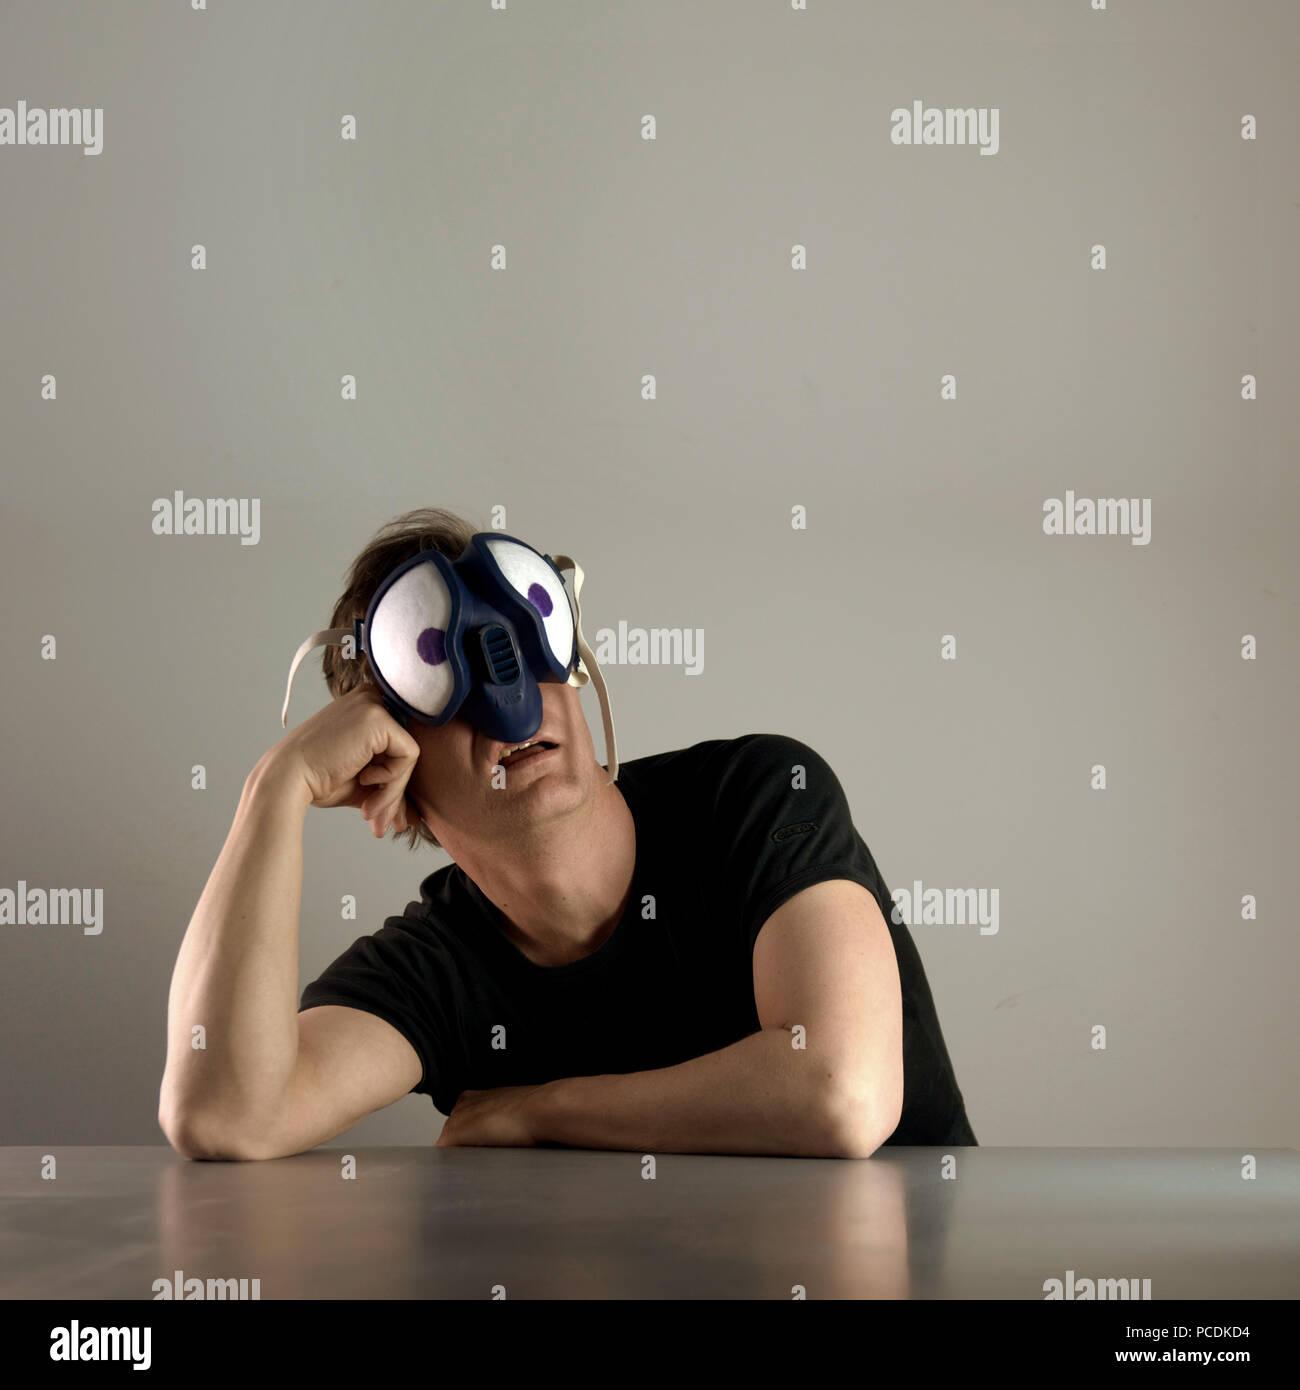 man,mask,compound eye - Stock Image